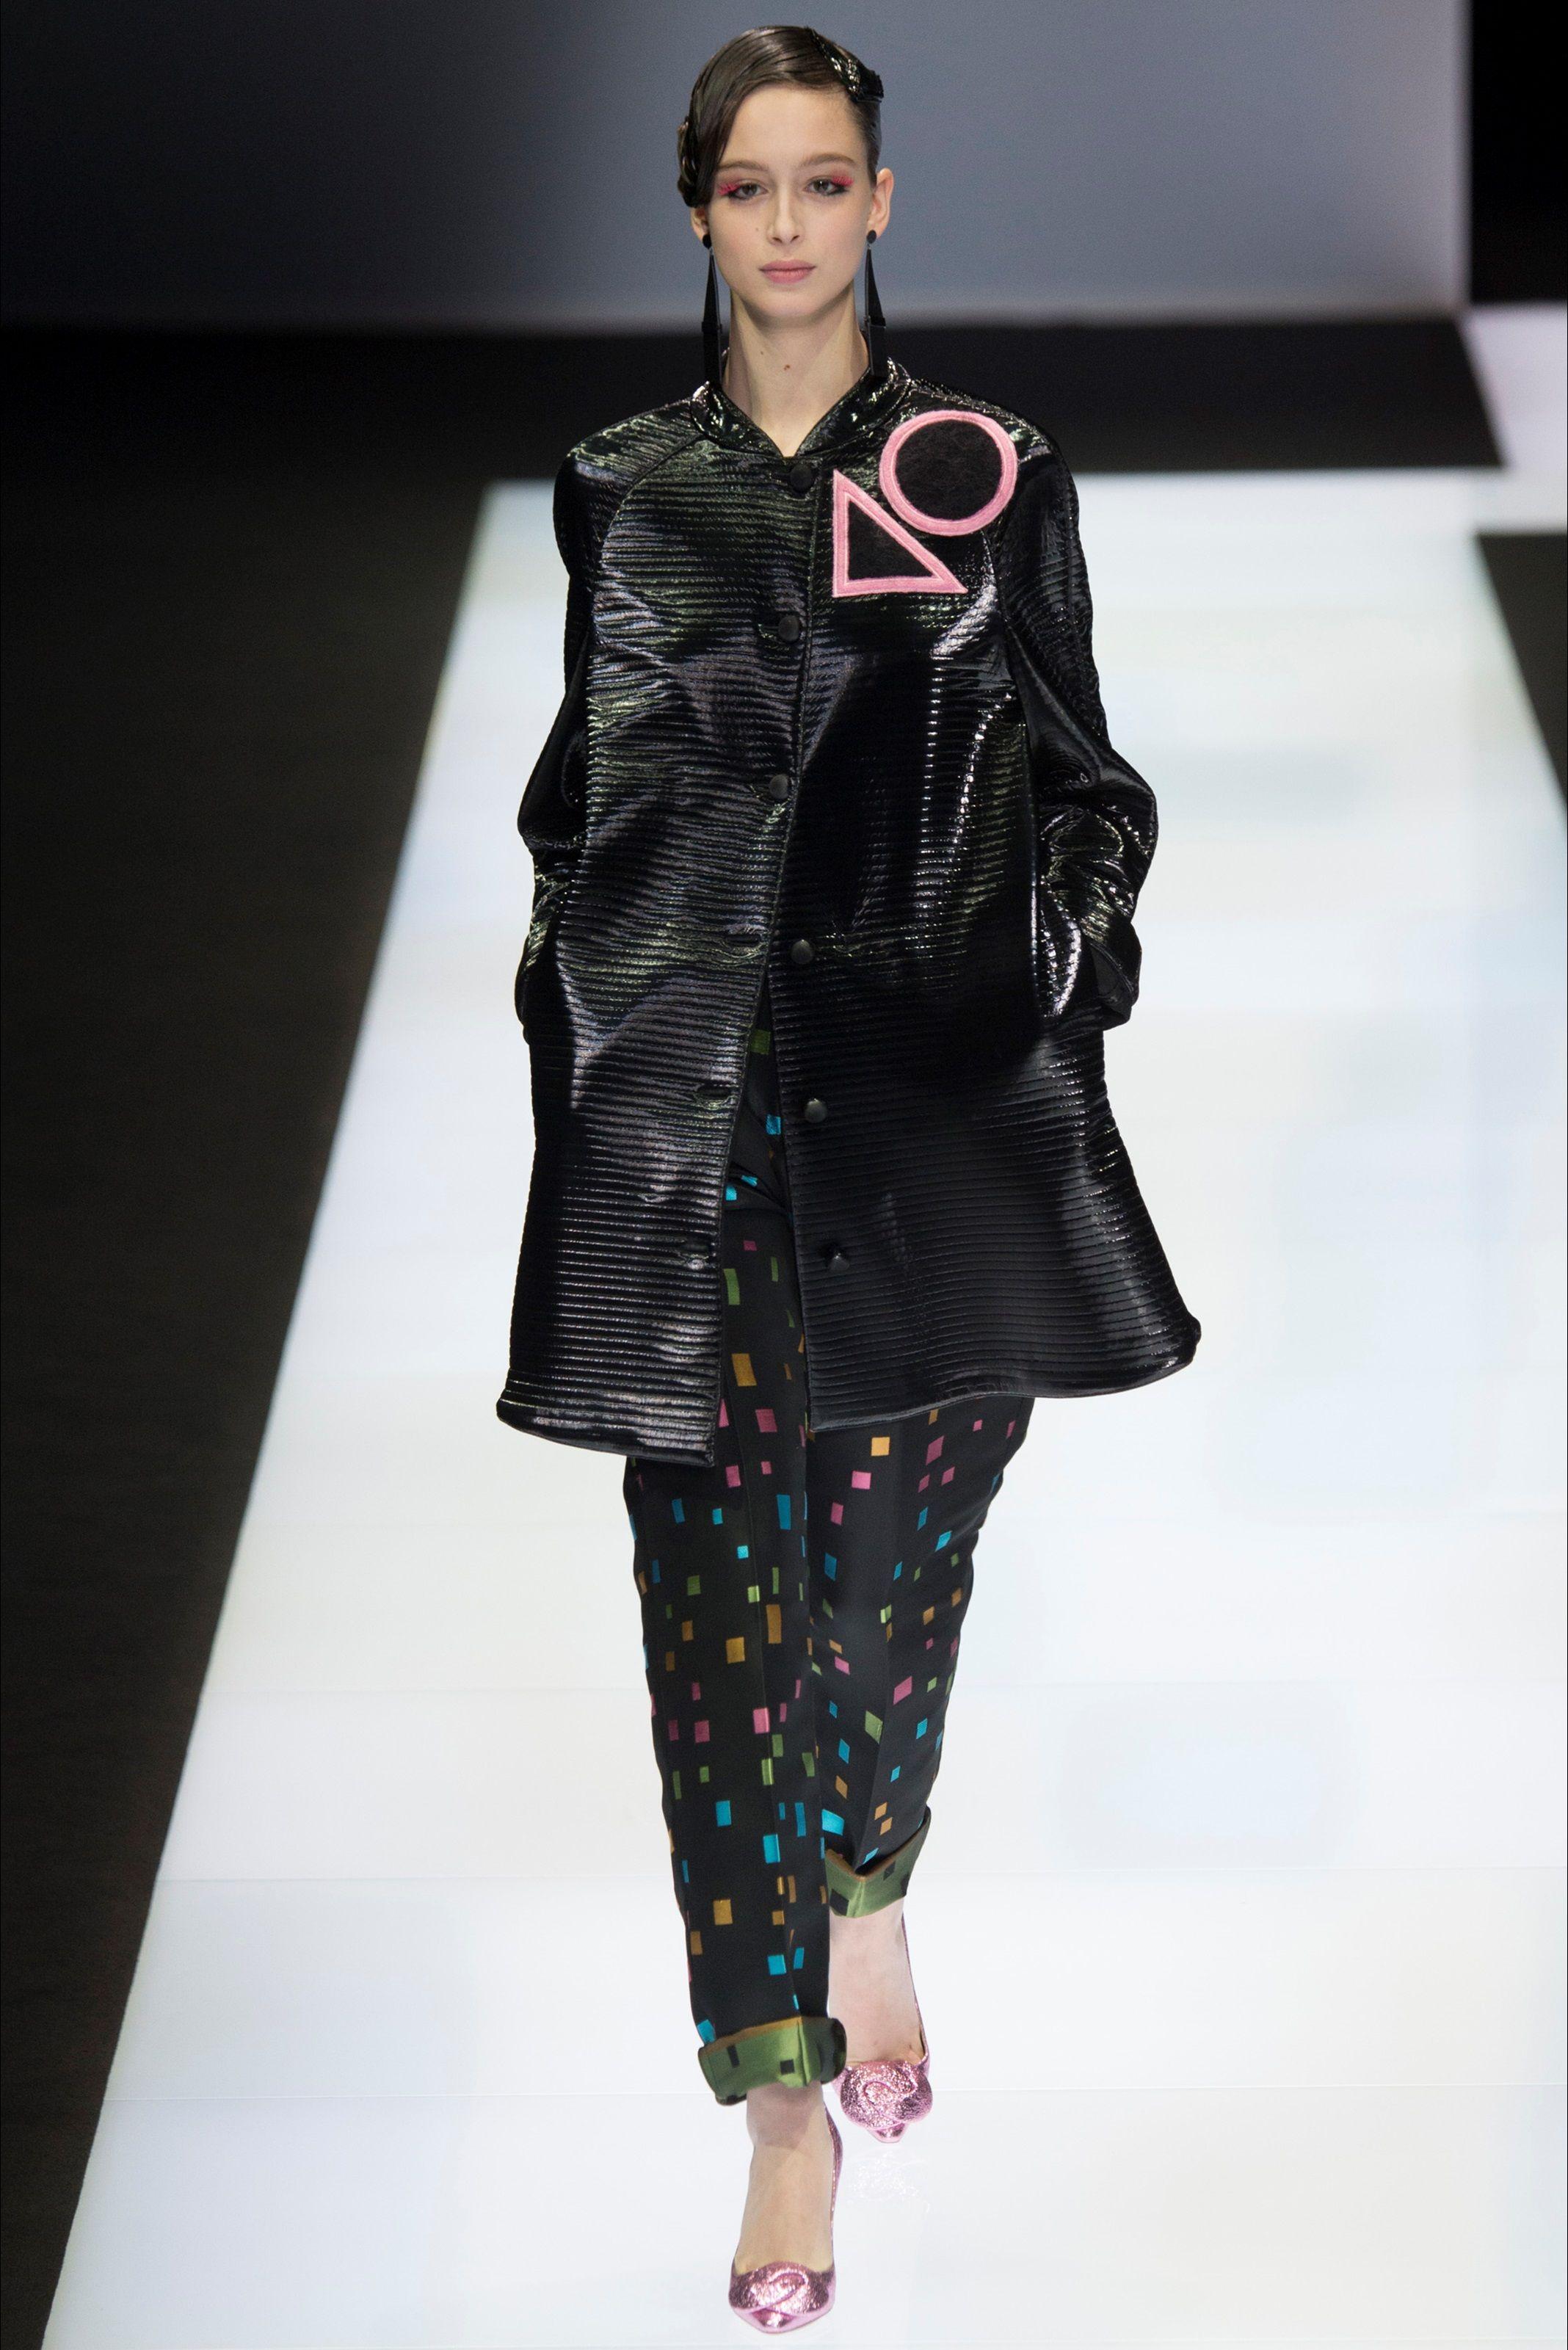 2ba0c79a2988 Emporio Armani Fall 2016 Ready-to-Wear Collection - Vogue Fall Fashion 2016